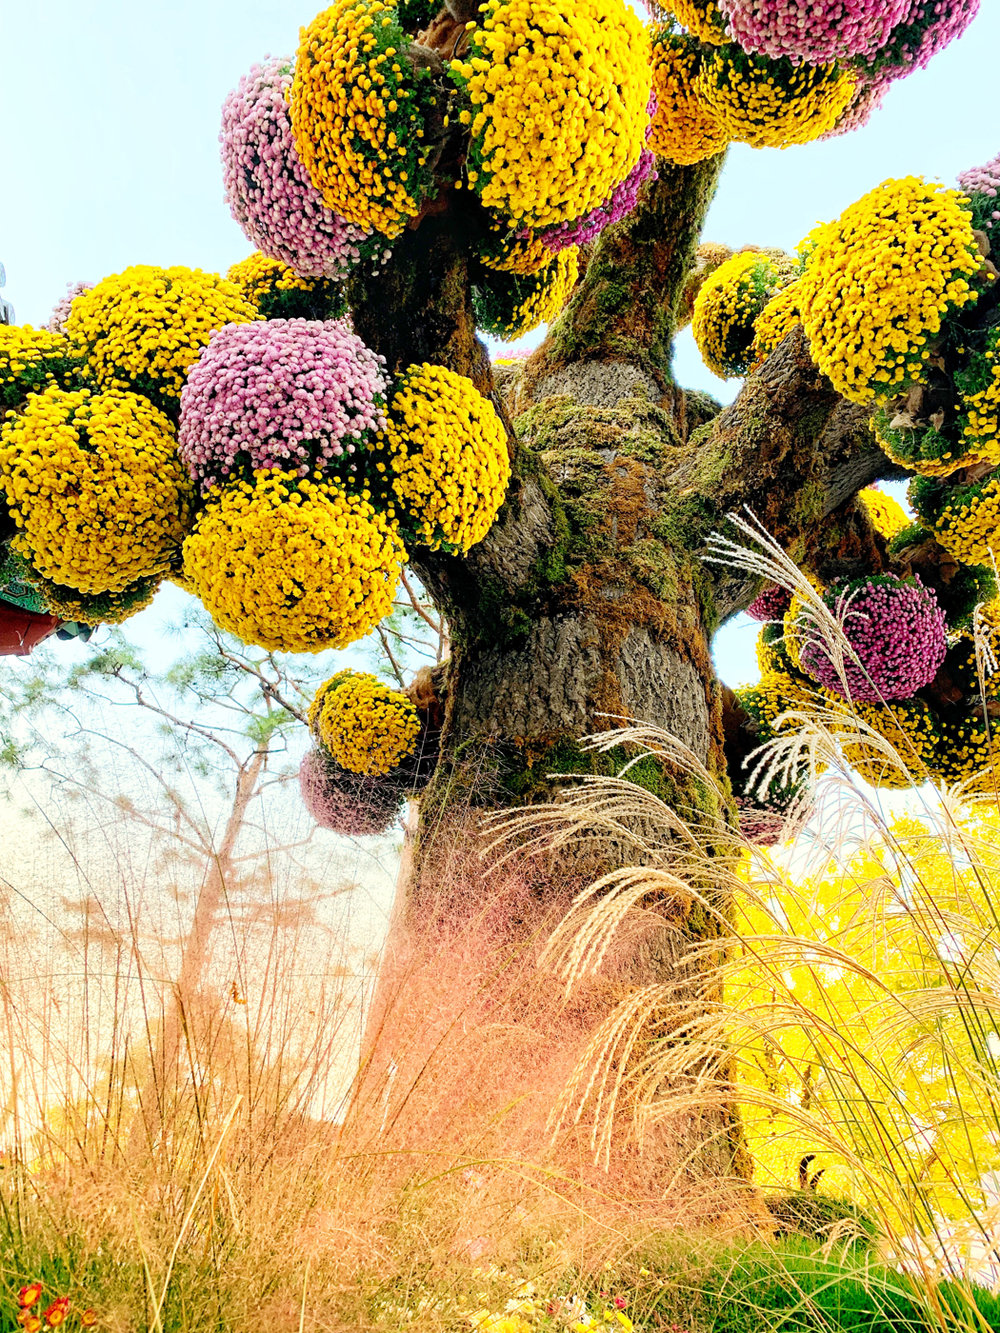 Autumn Chrysanthemum Festival at Jogyesa Temple | Seoul, Korea Travel Guide | The Chic Diary